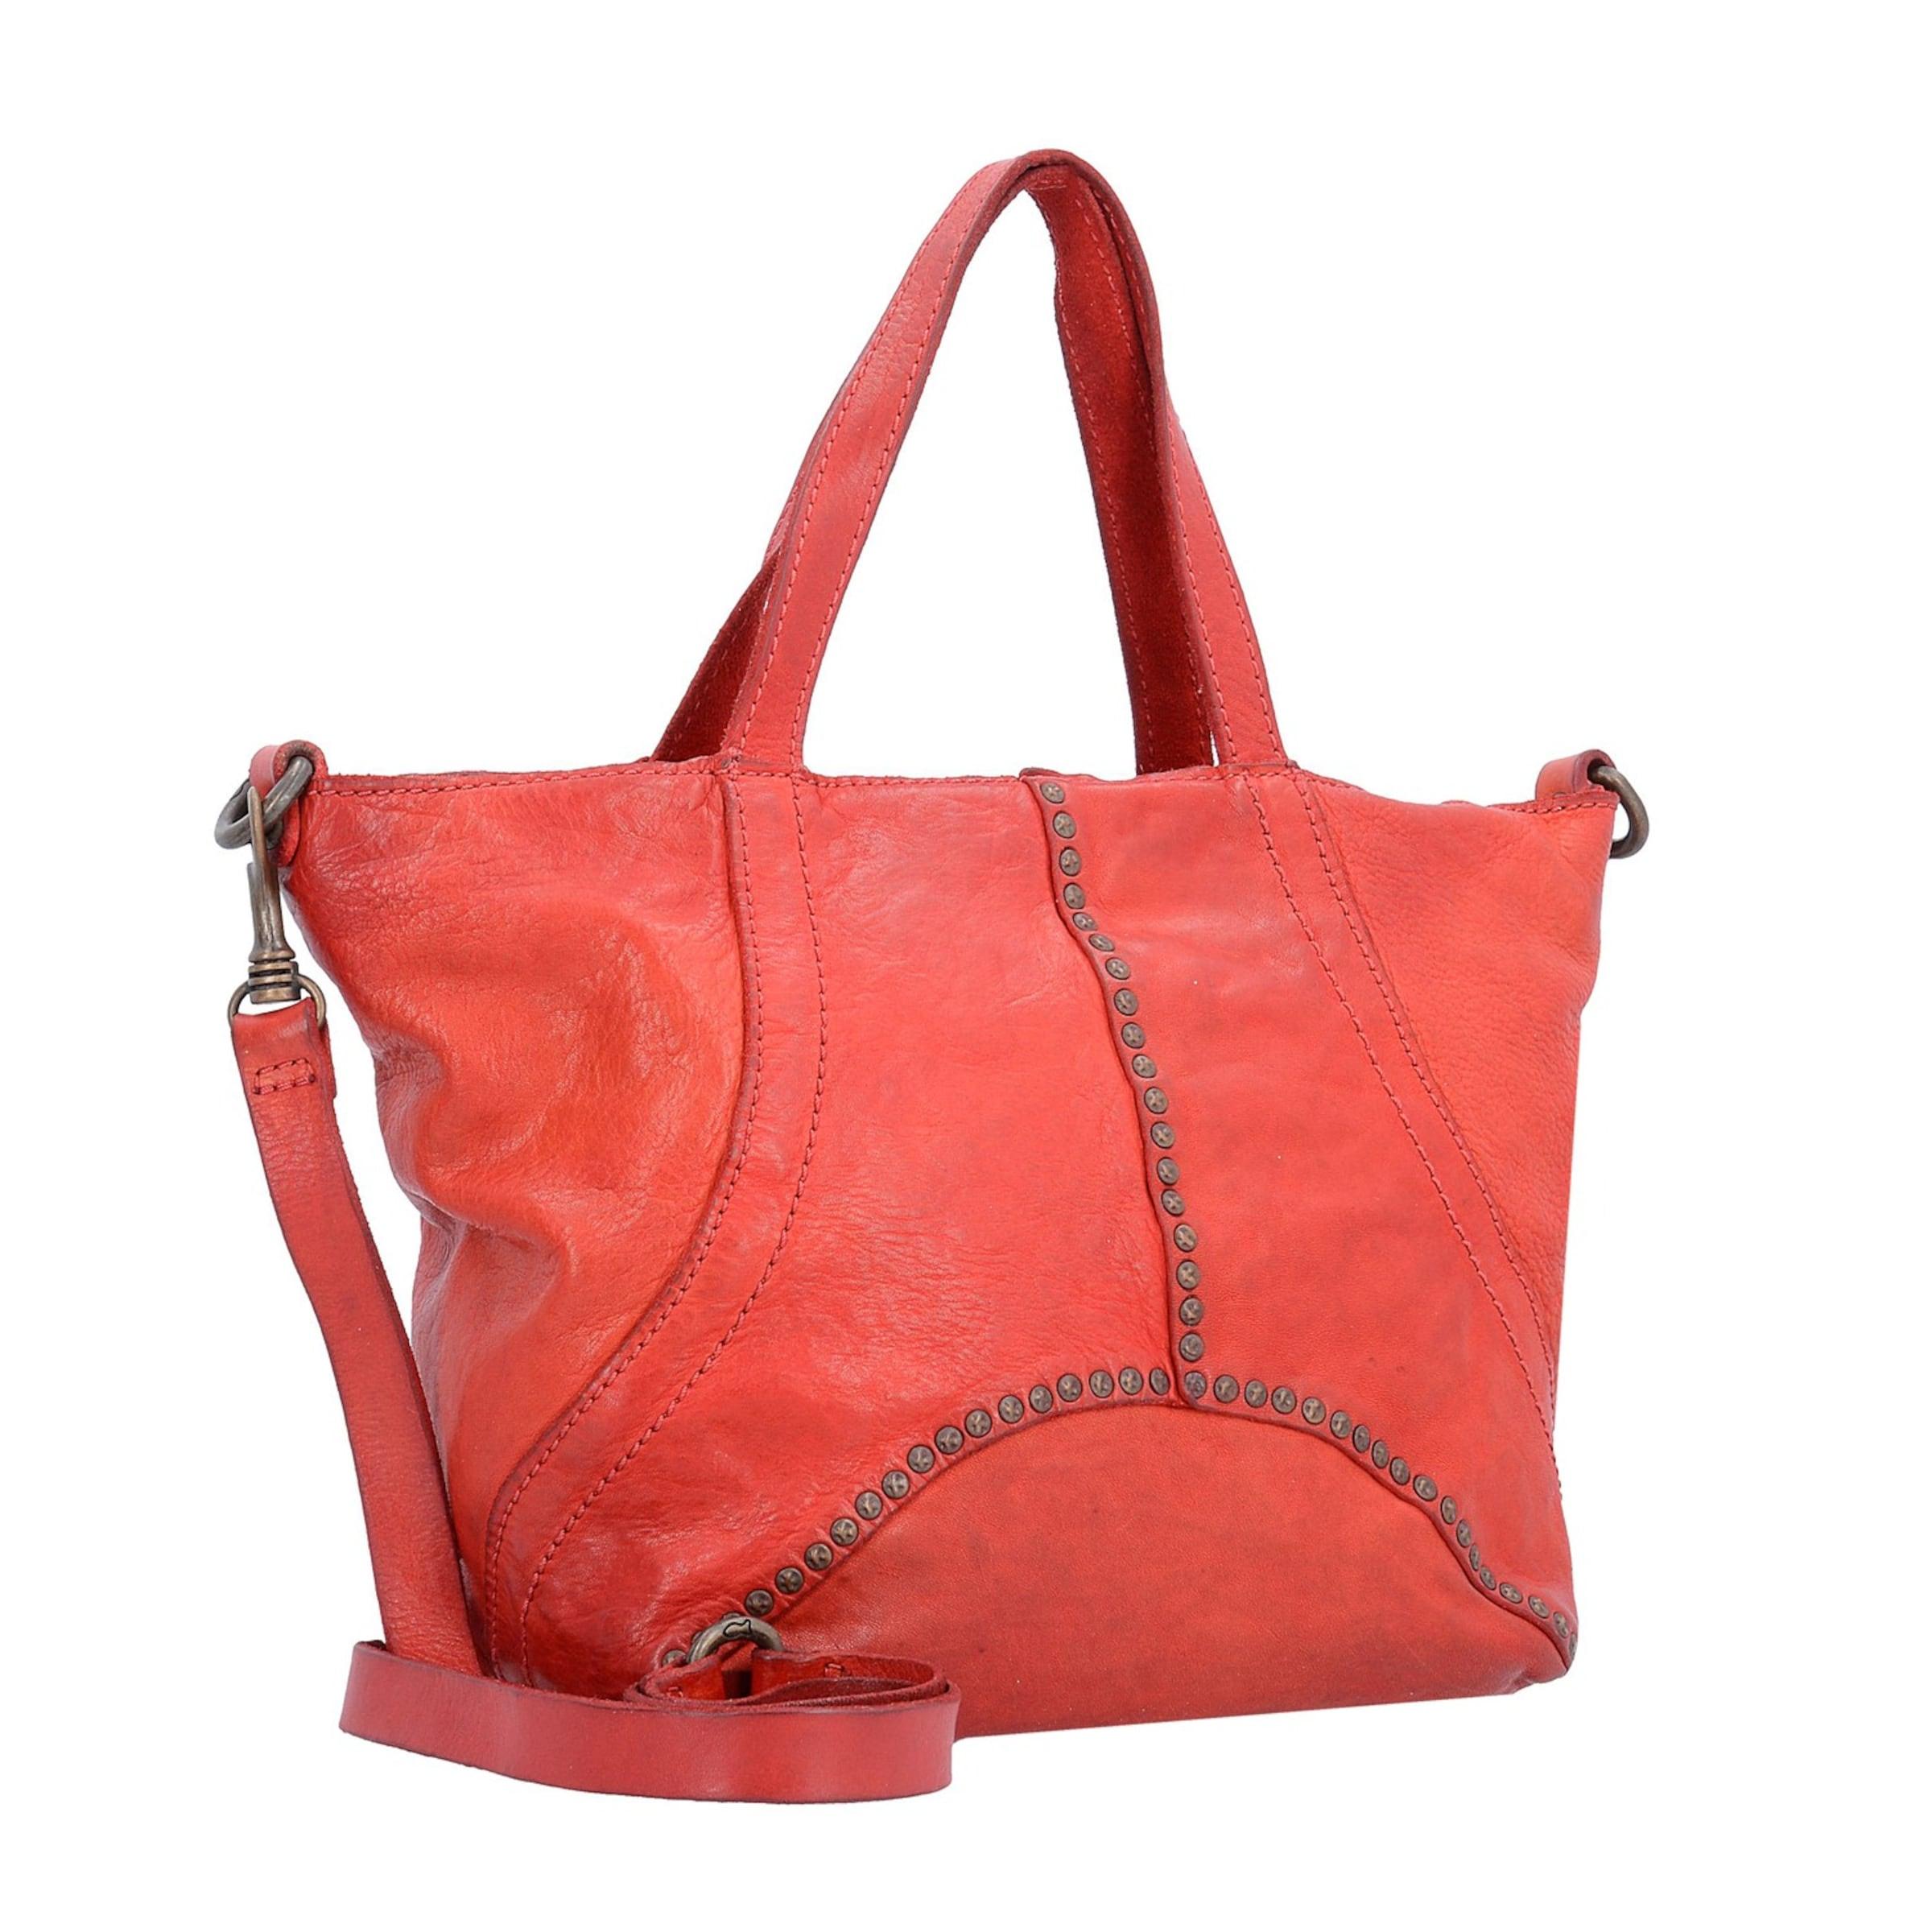 24 Leder Campomaggi cm Traditional Campomaggi Leder Campomaggi Traditional 24 Handtasche Handtasche cm vRqwR4